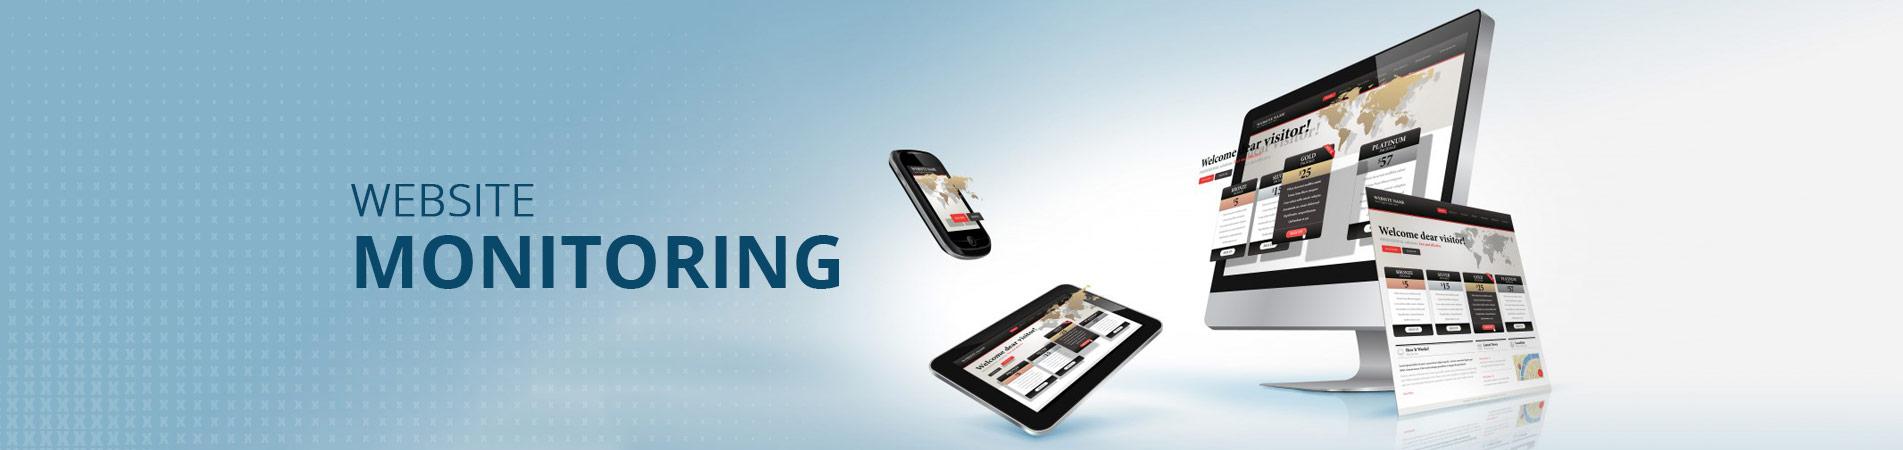 Web design copywriting services in india